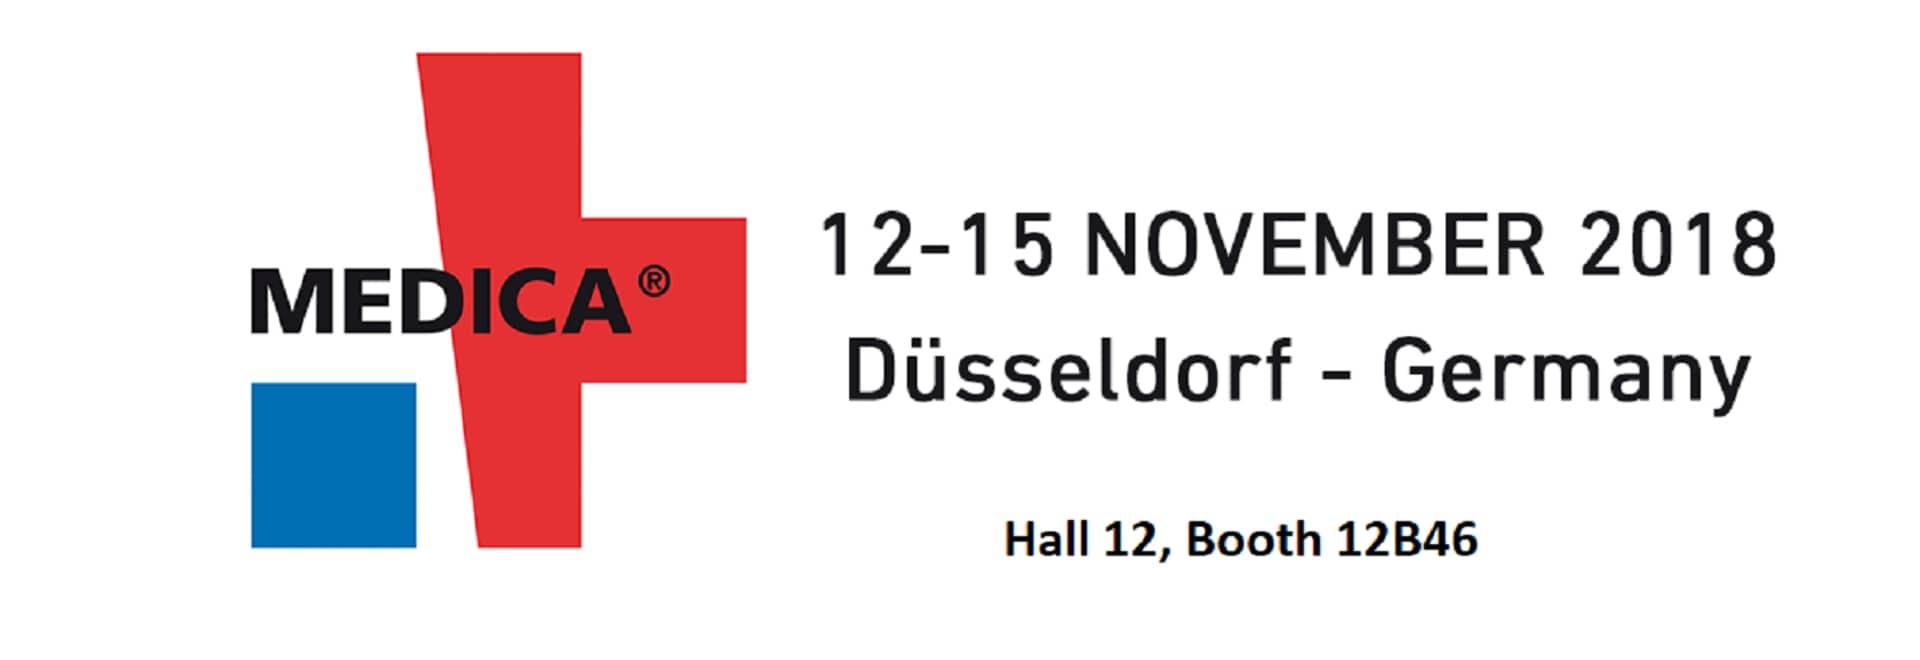 12-15 de noviembre – MEDICA 2018 DÜSSELDORF